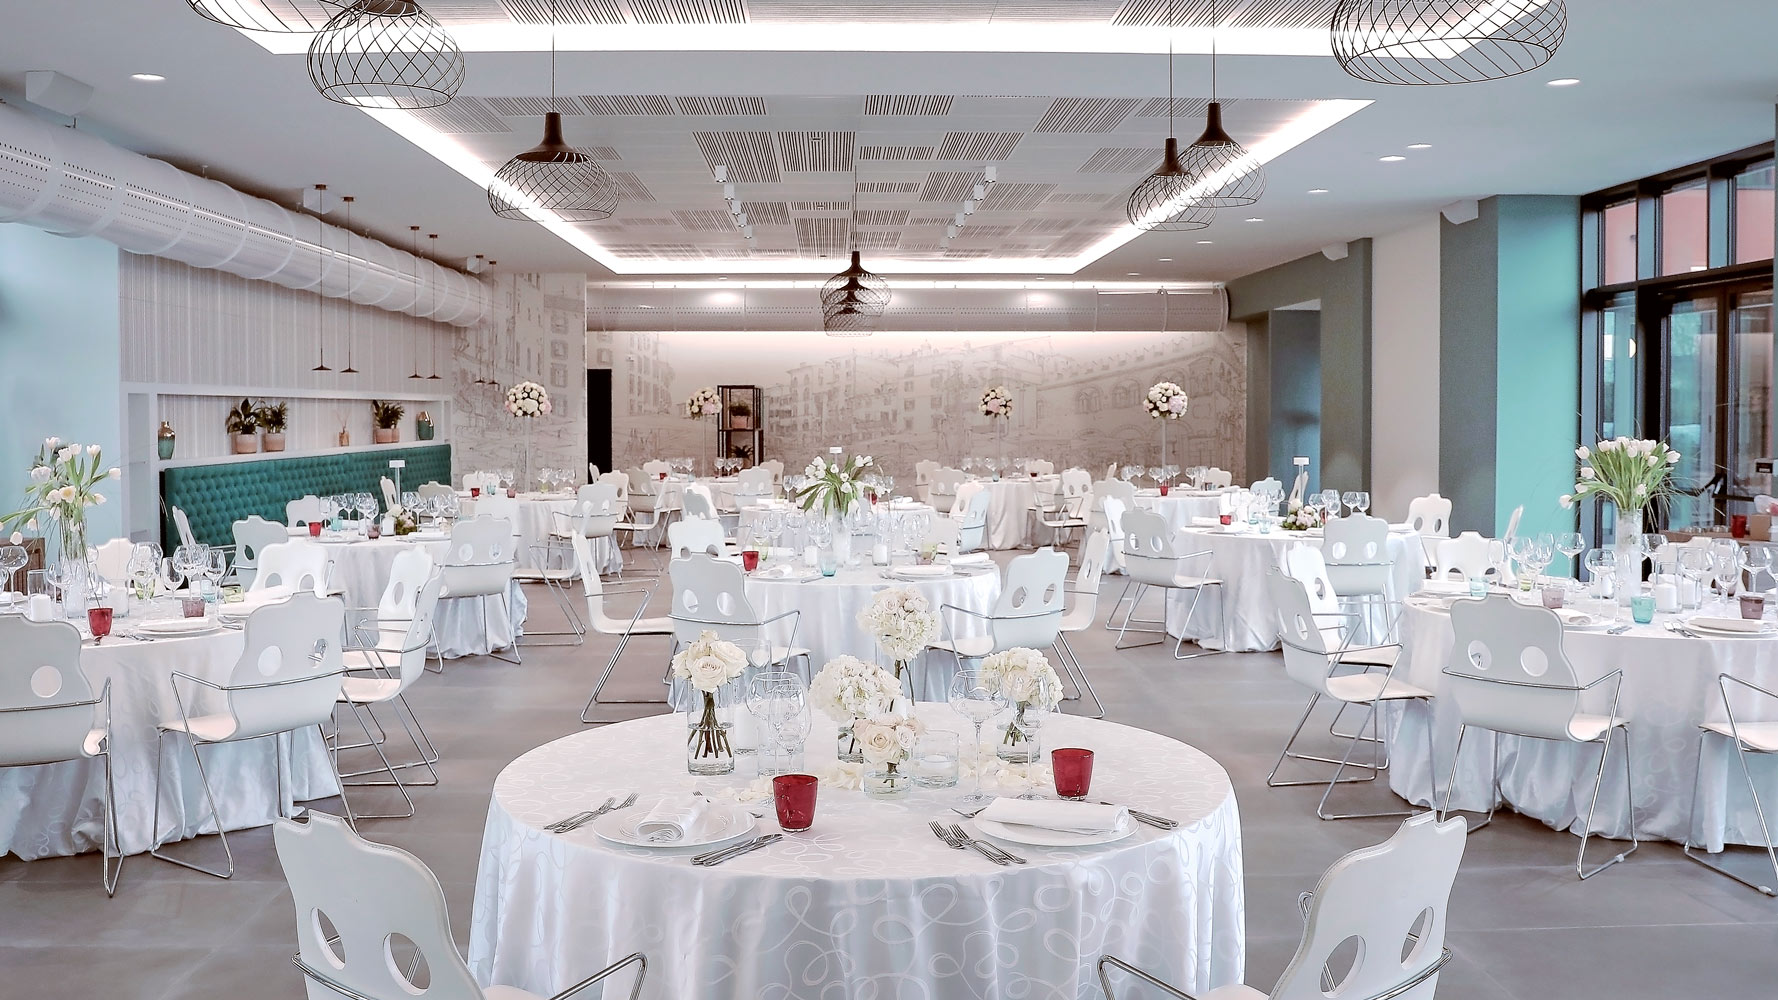 Nuova sala Matrimonio rubino